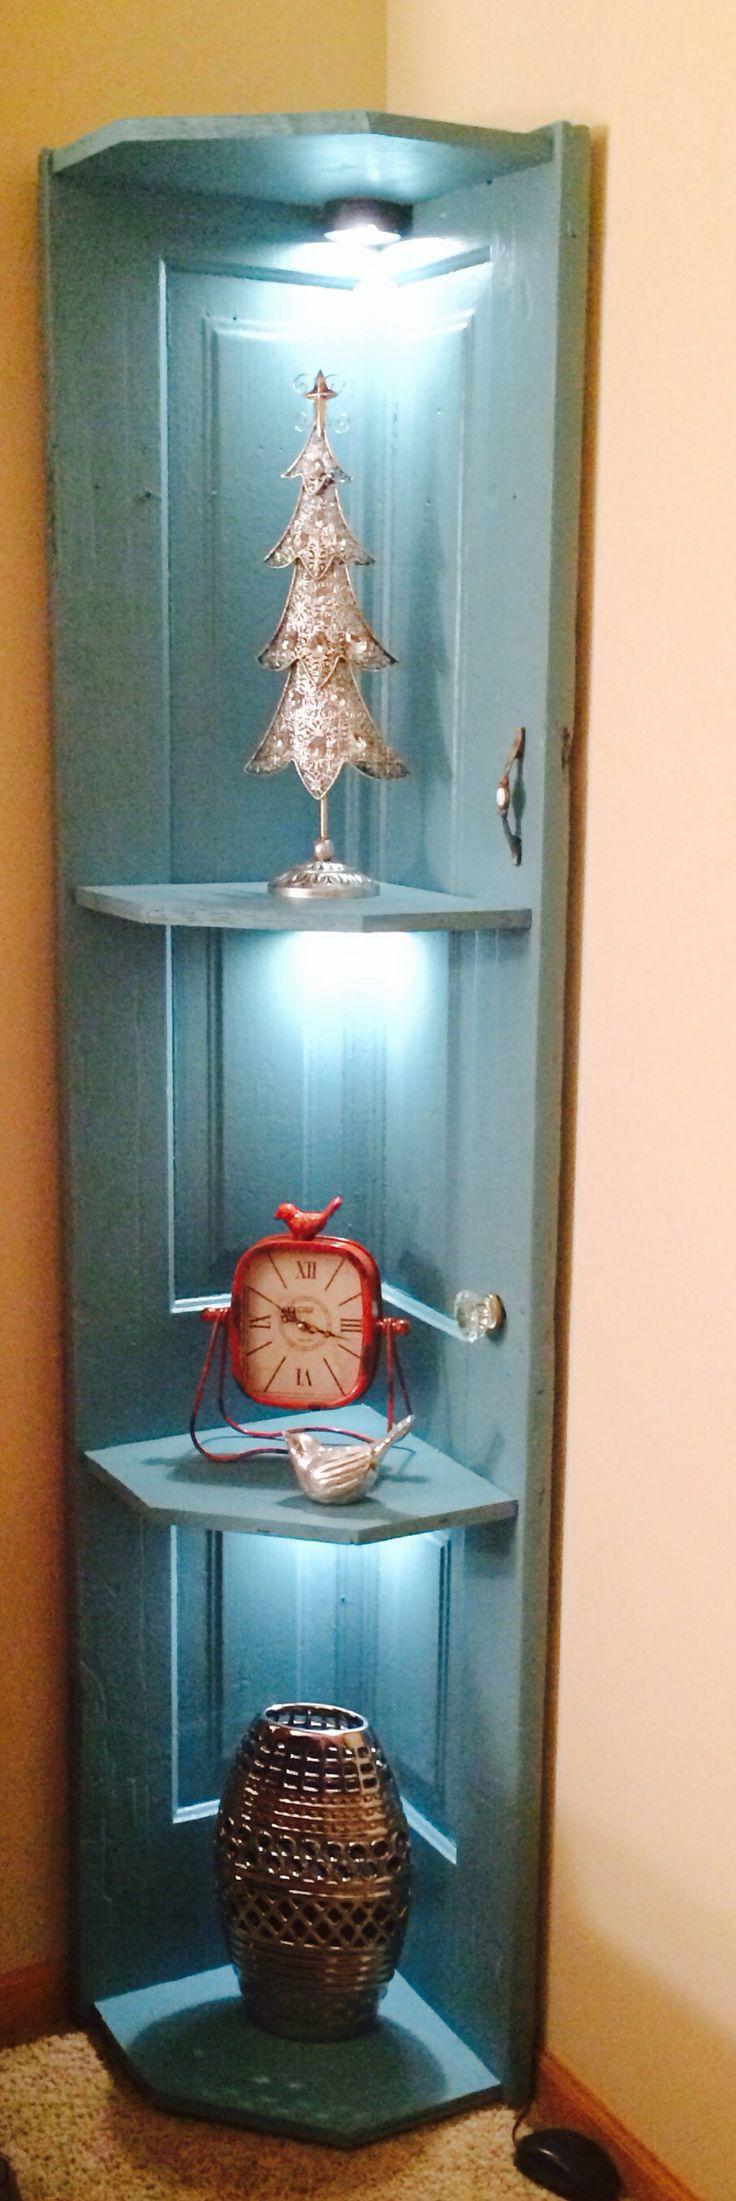 Nice Corner Shelf Made From Old Door | Corner Shelf W/lighting Made From An Old